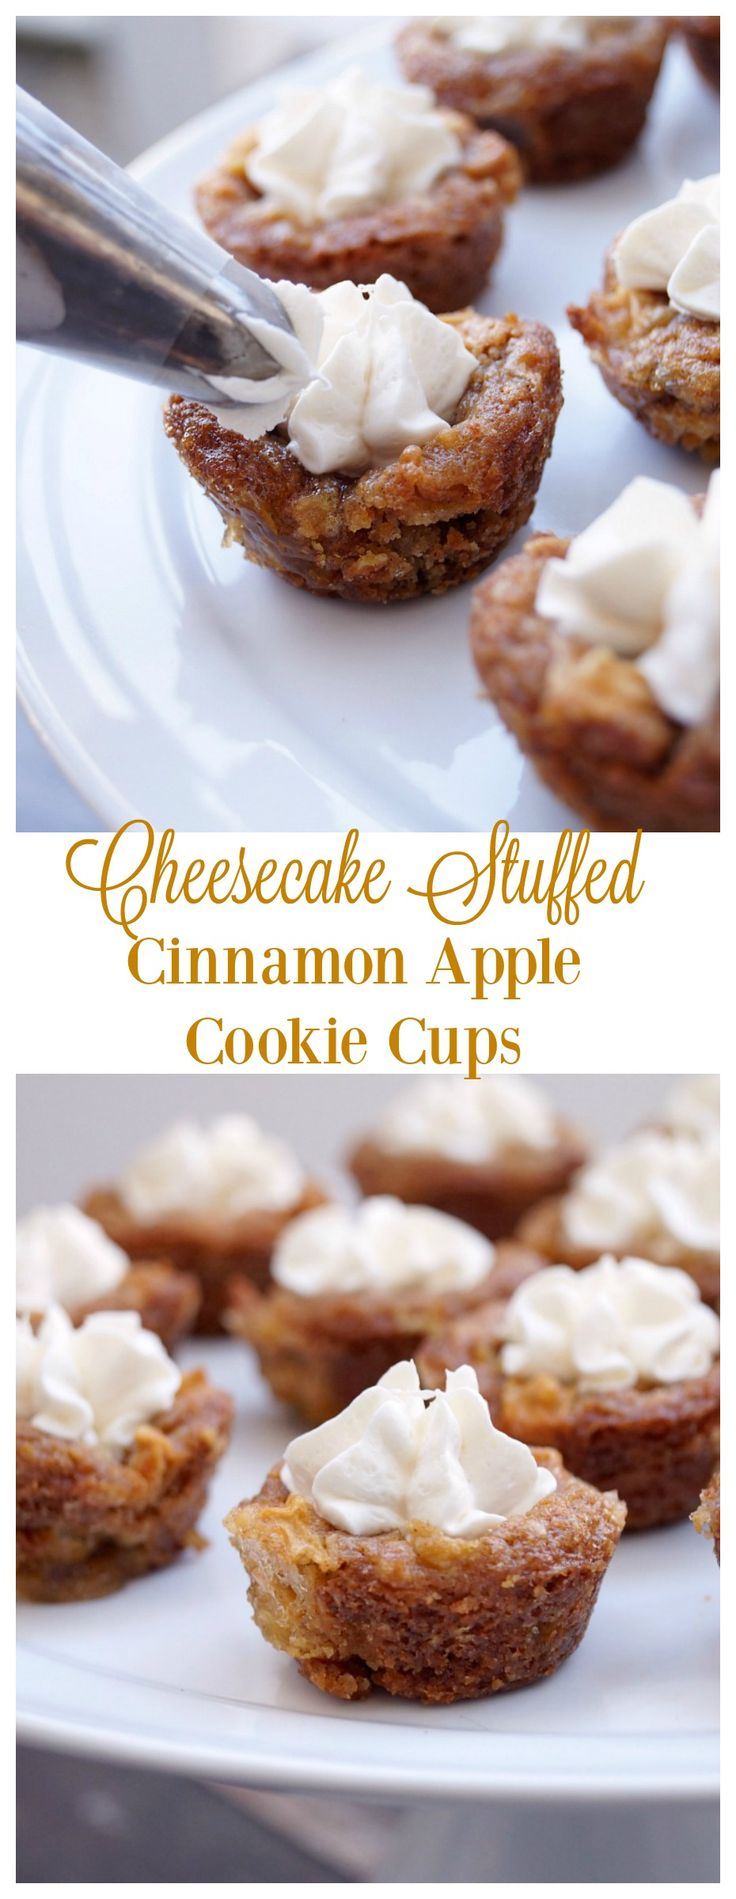 Cheesecake Stuffed Cinnamon Apple Cookie Cups [ad] #nestleholidaybaking @verybestbaking